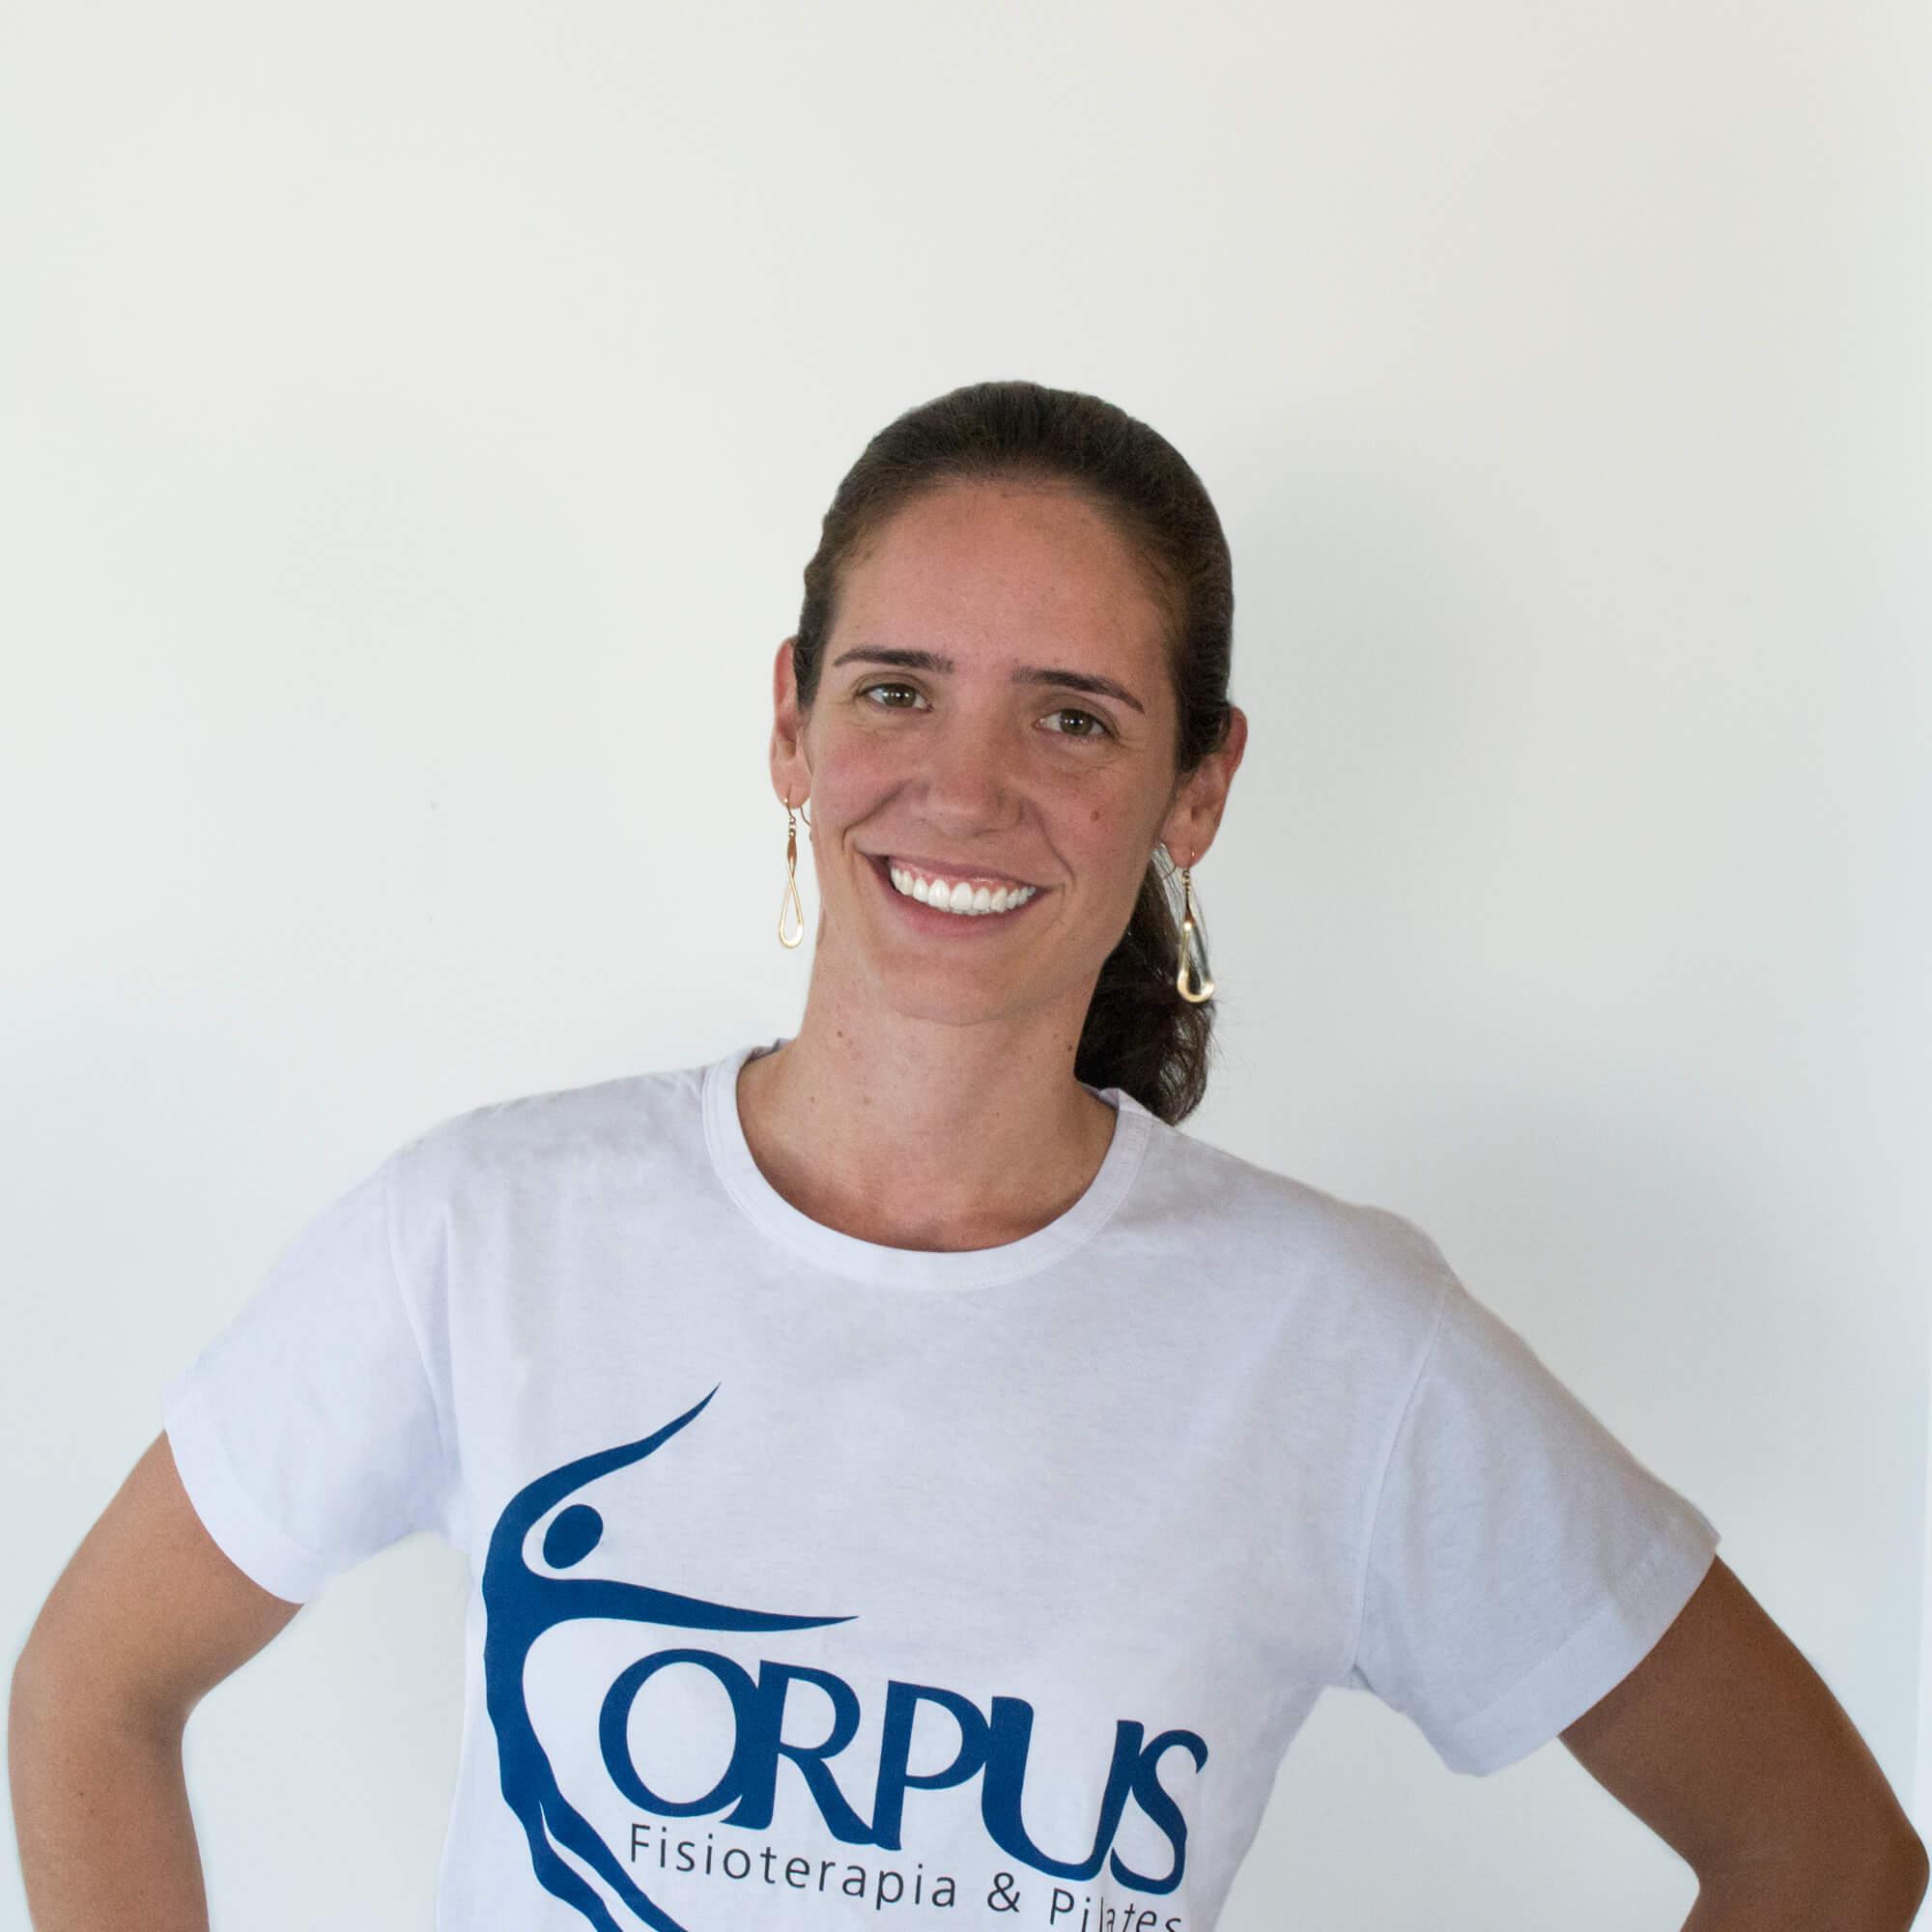 Dra. Larissa Vilela - Fisioterapia & Pilates